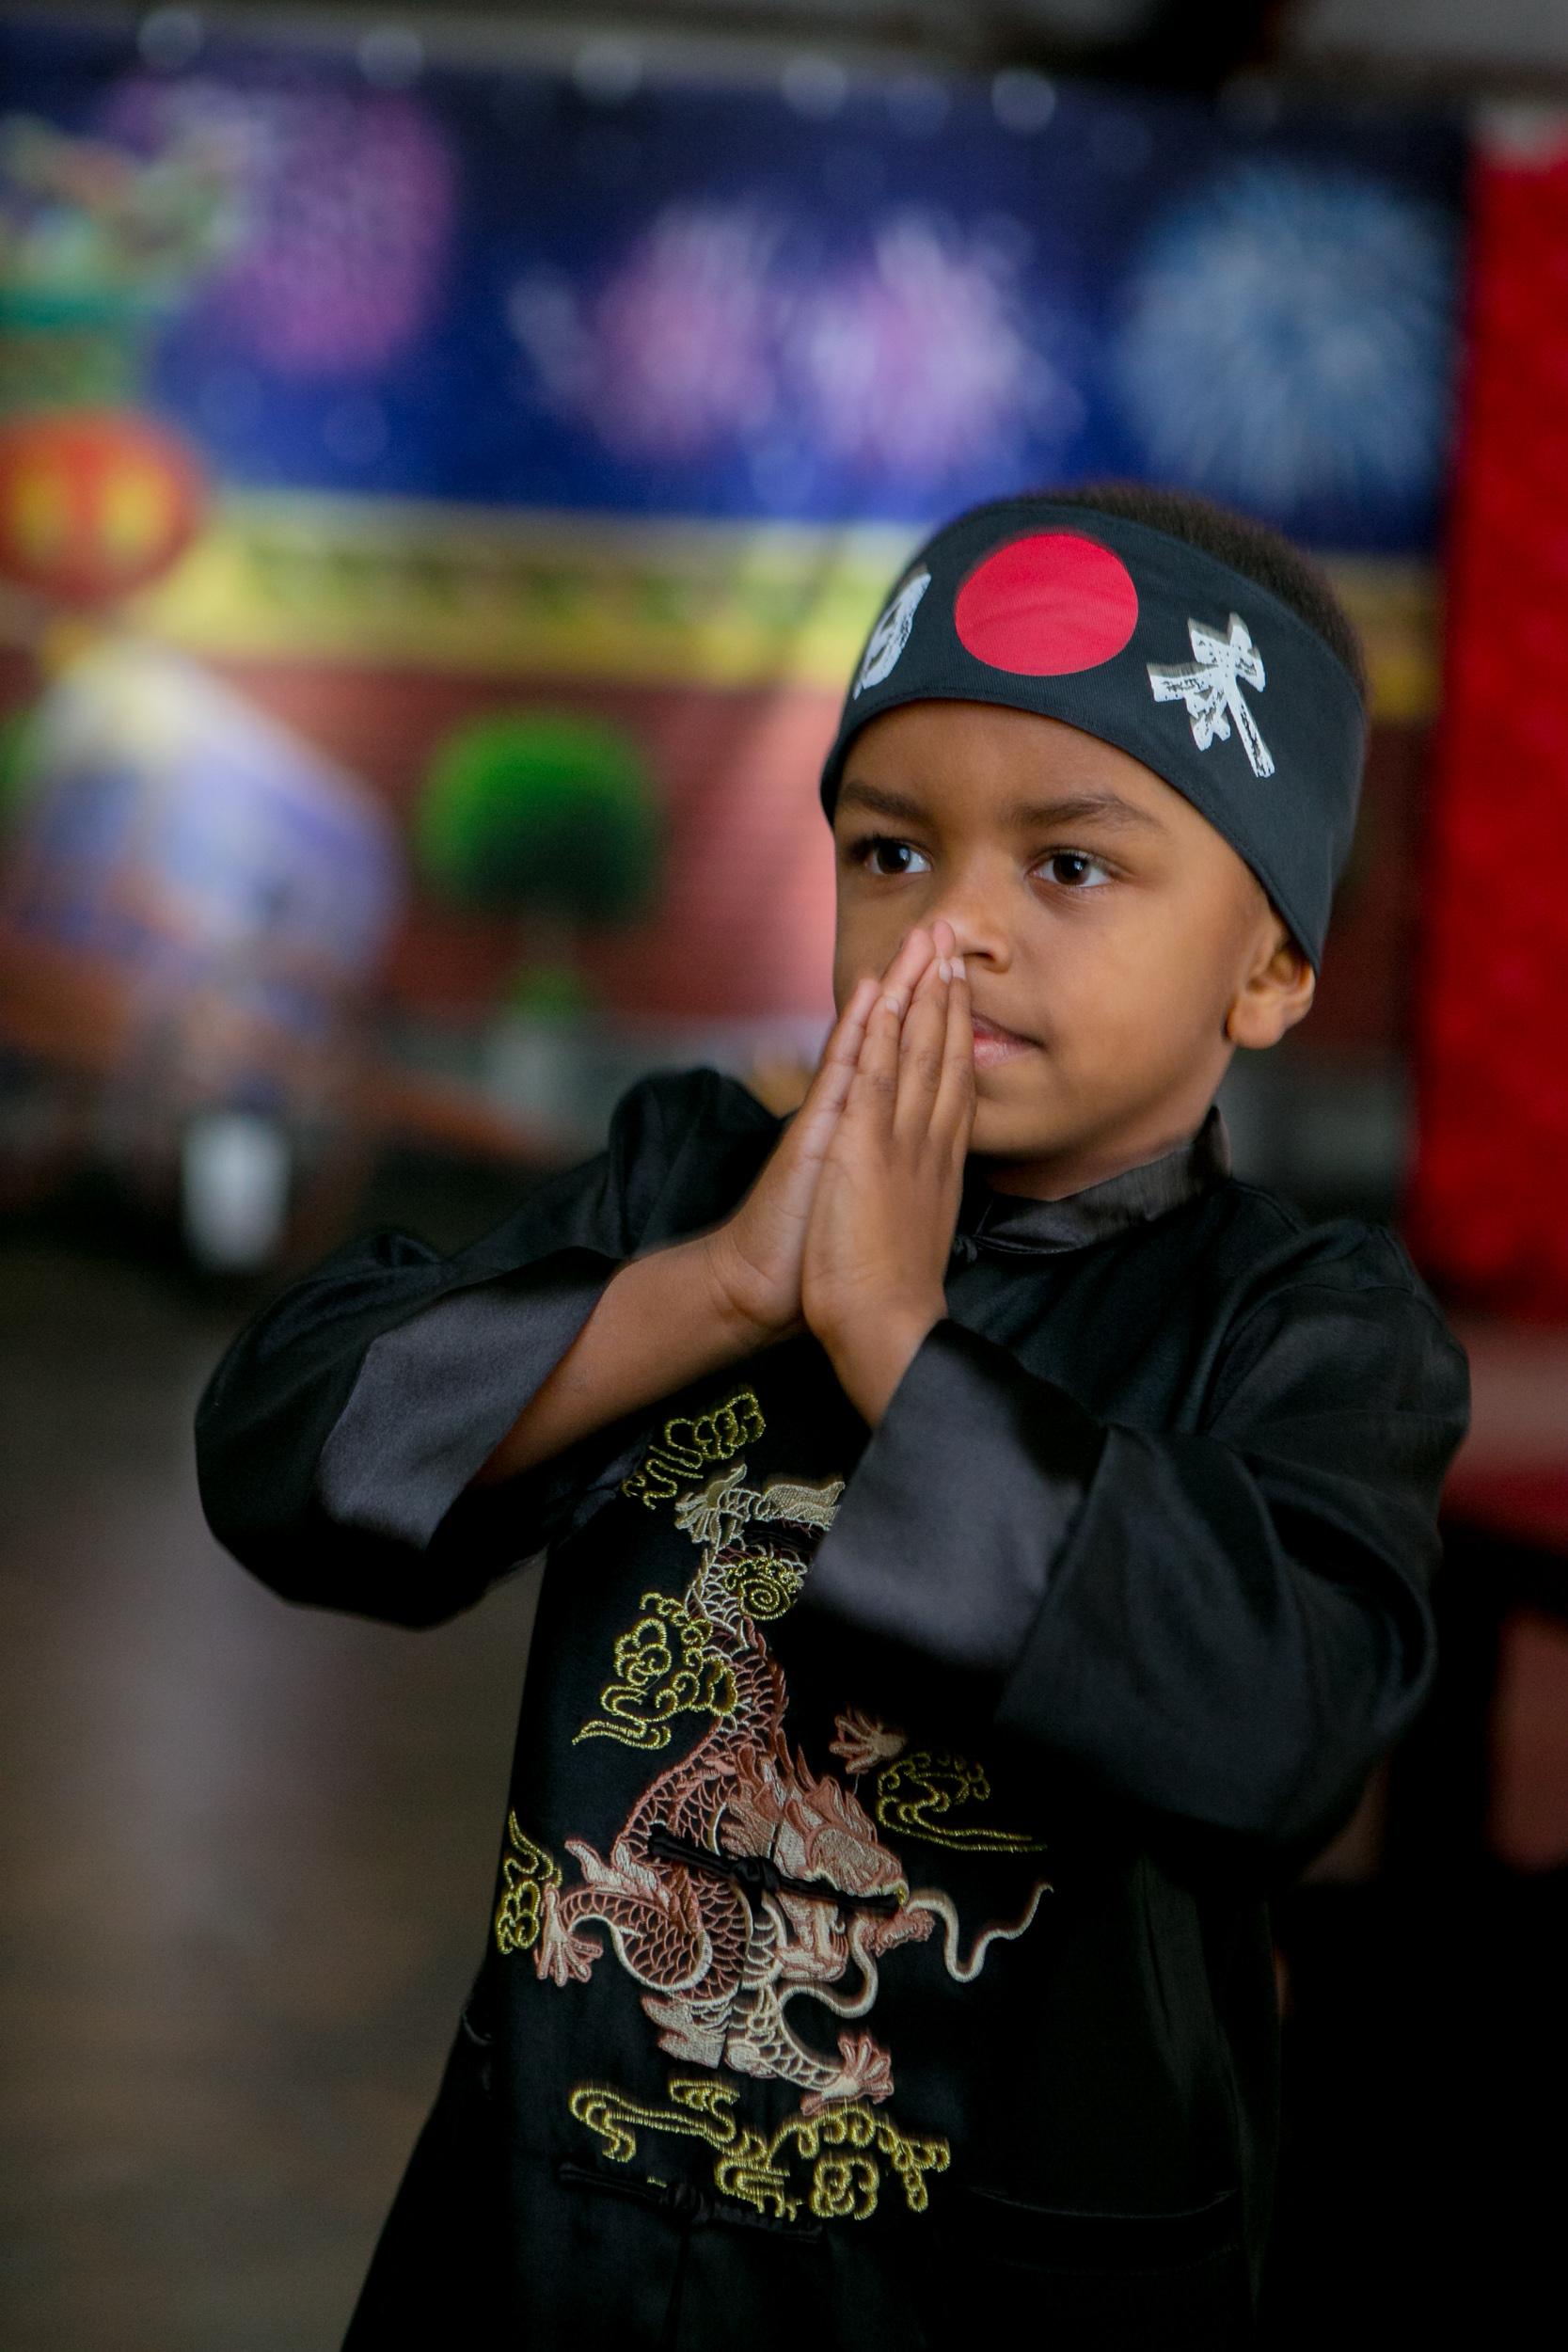 Finnley's 5th Birthday Kubo Ninja Party Extravaganza - Phillip Van Nostrand Photography